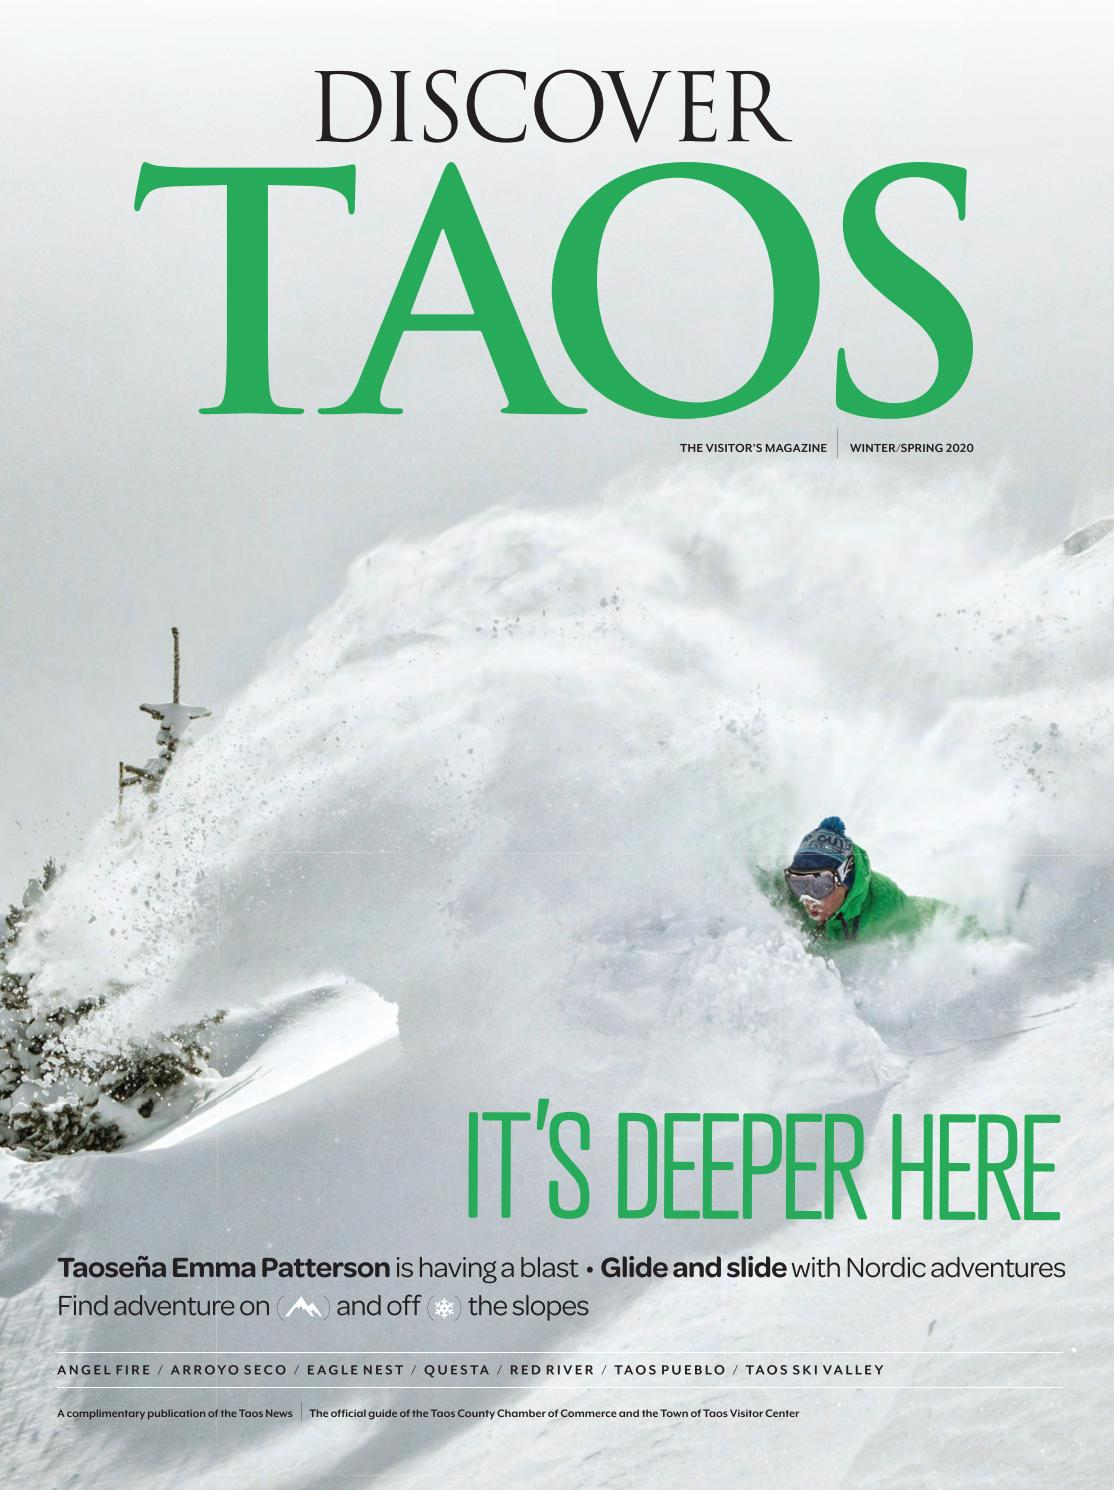 POSTER WINTER SPORT SKI TAOS NEW MEXICO MOUNTAINS SKIING VINTAGE REPRO FREE S//H